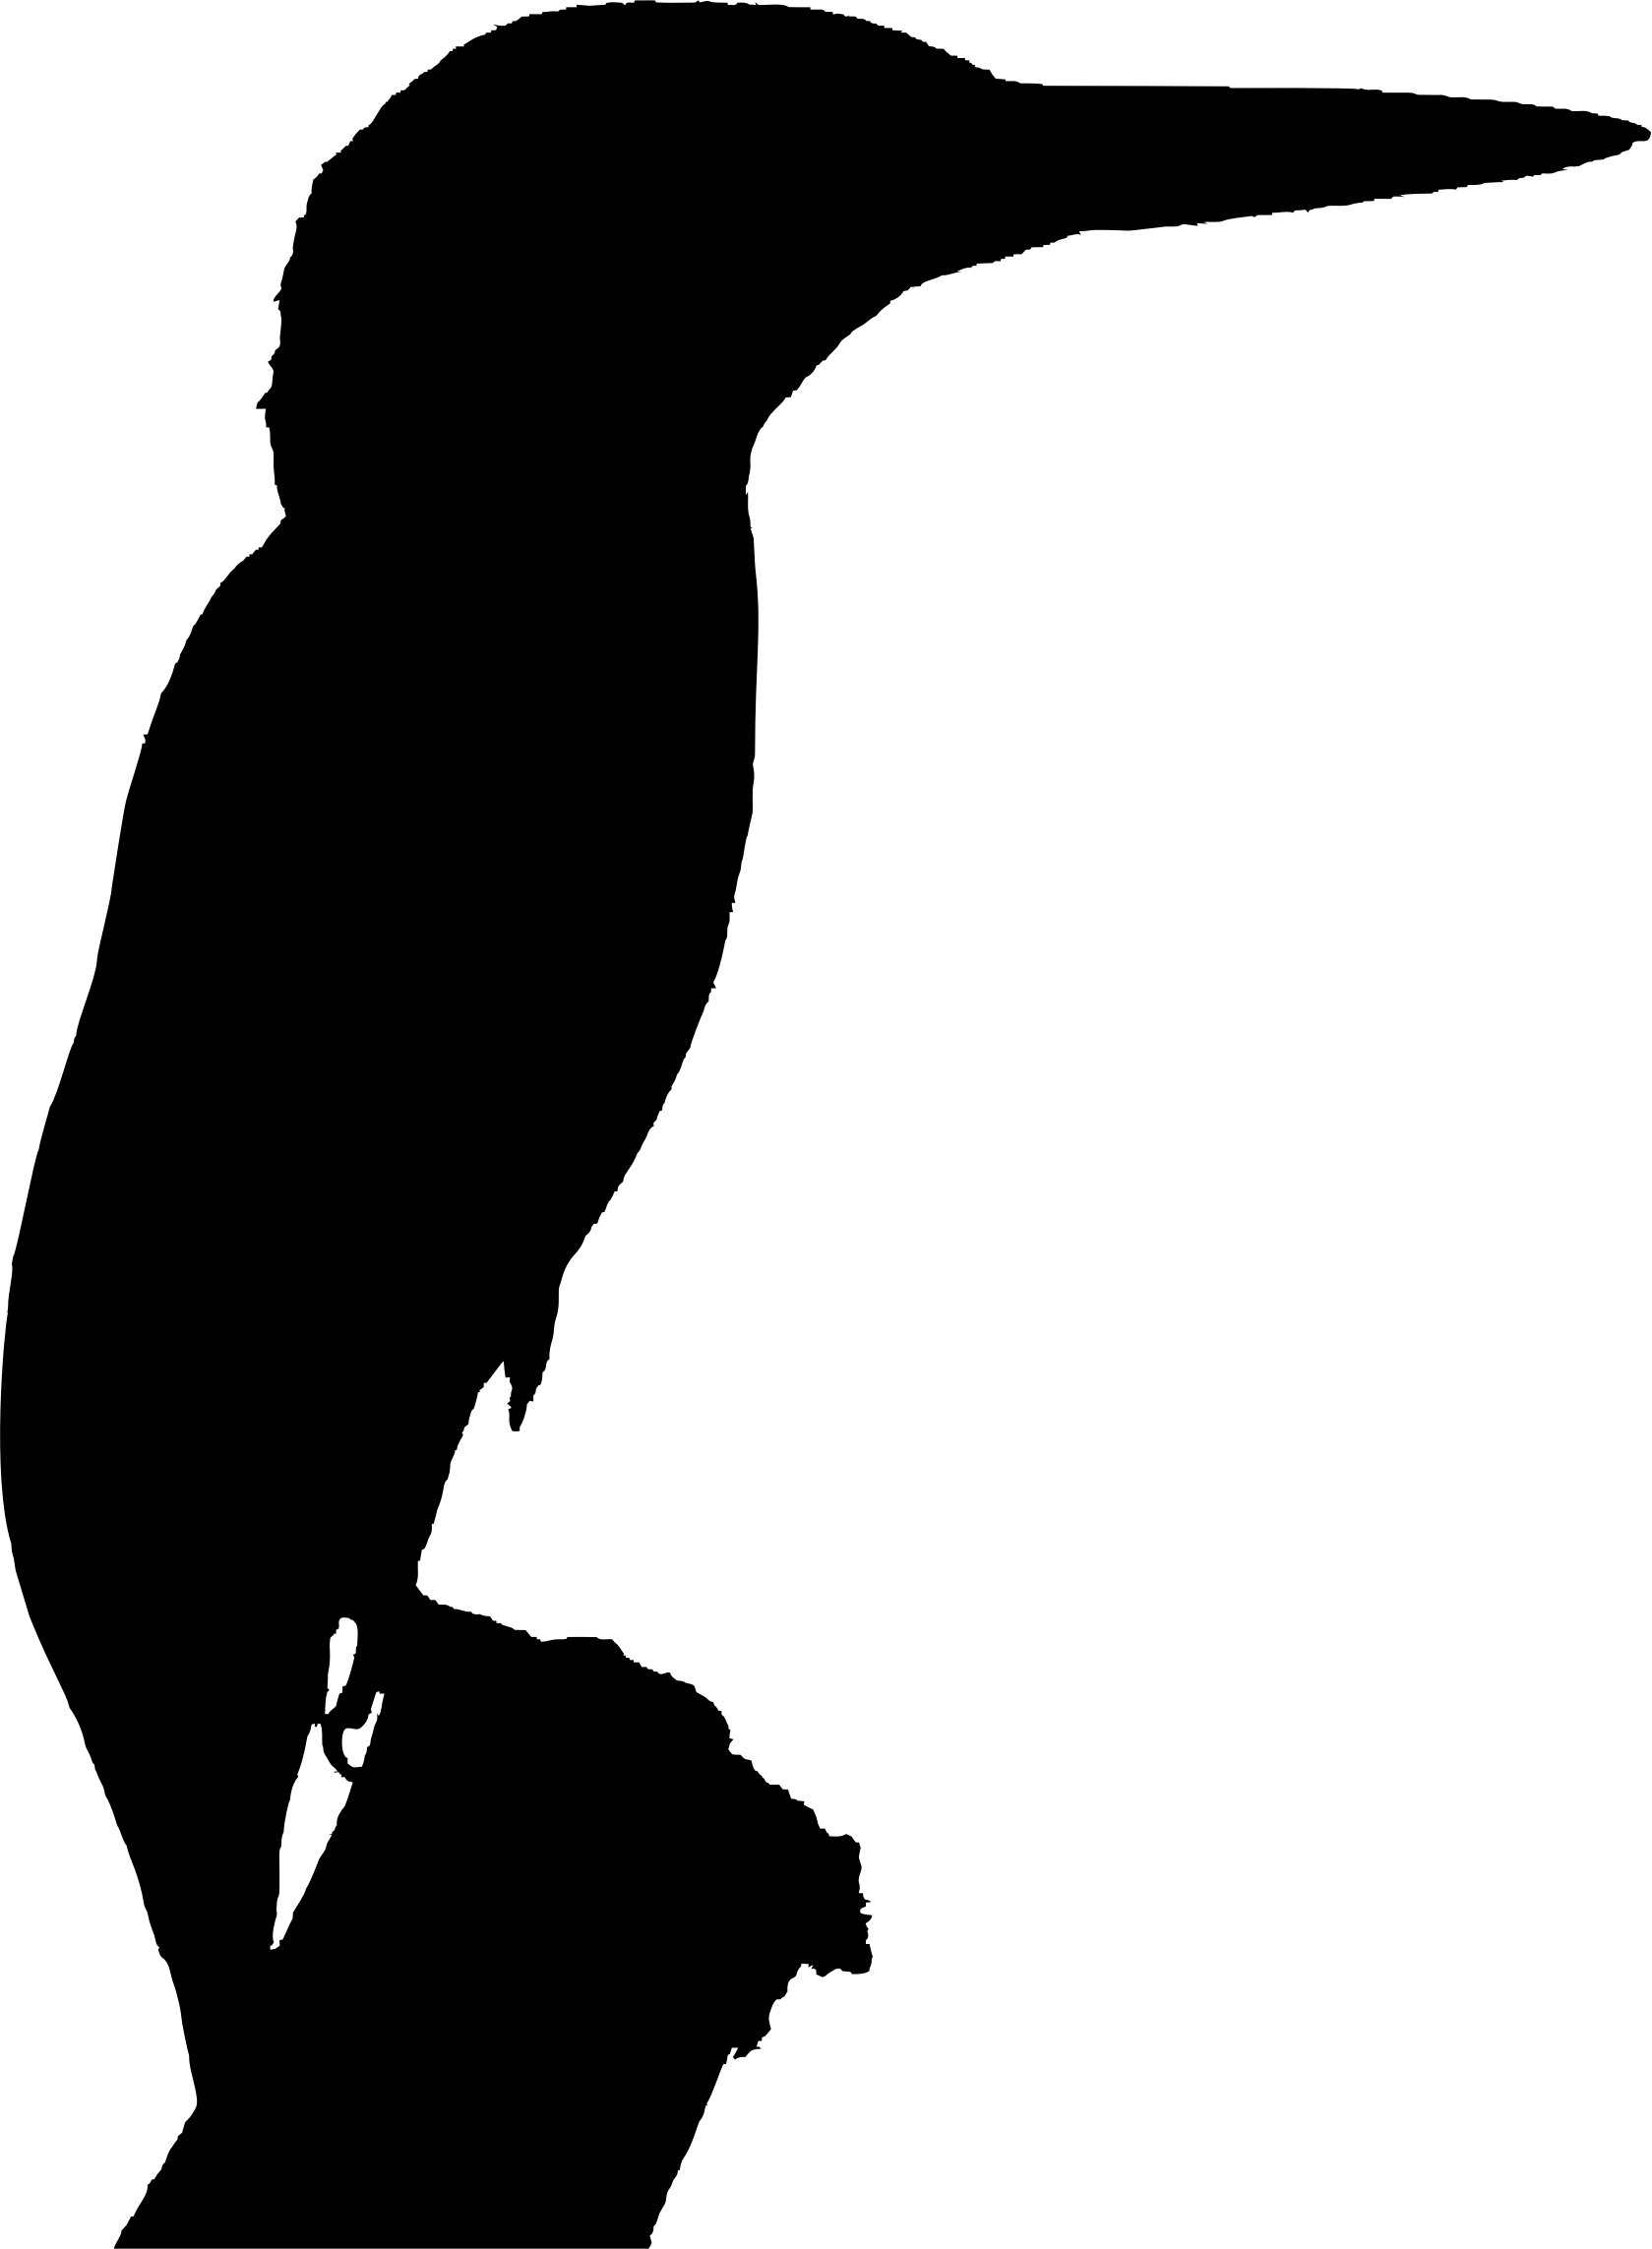 1679x2286 Clipart